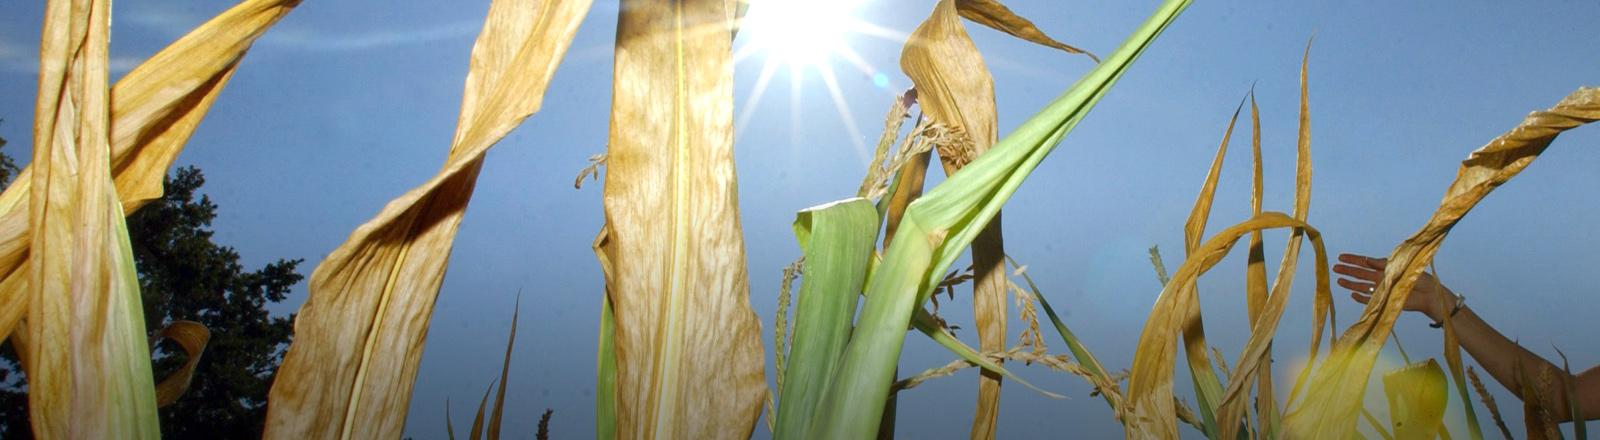 Vertrocknete Maispflanzen